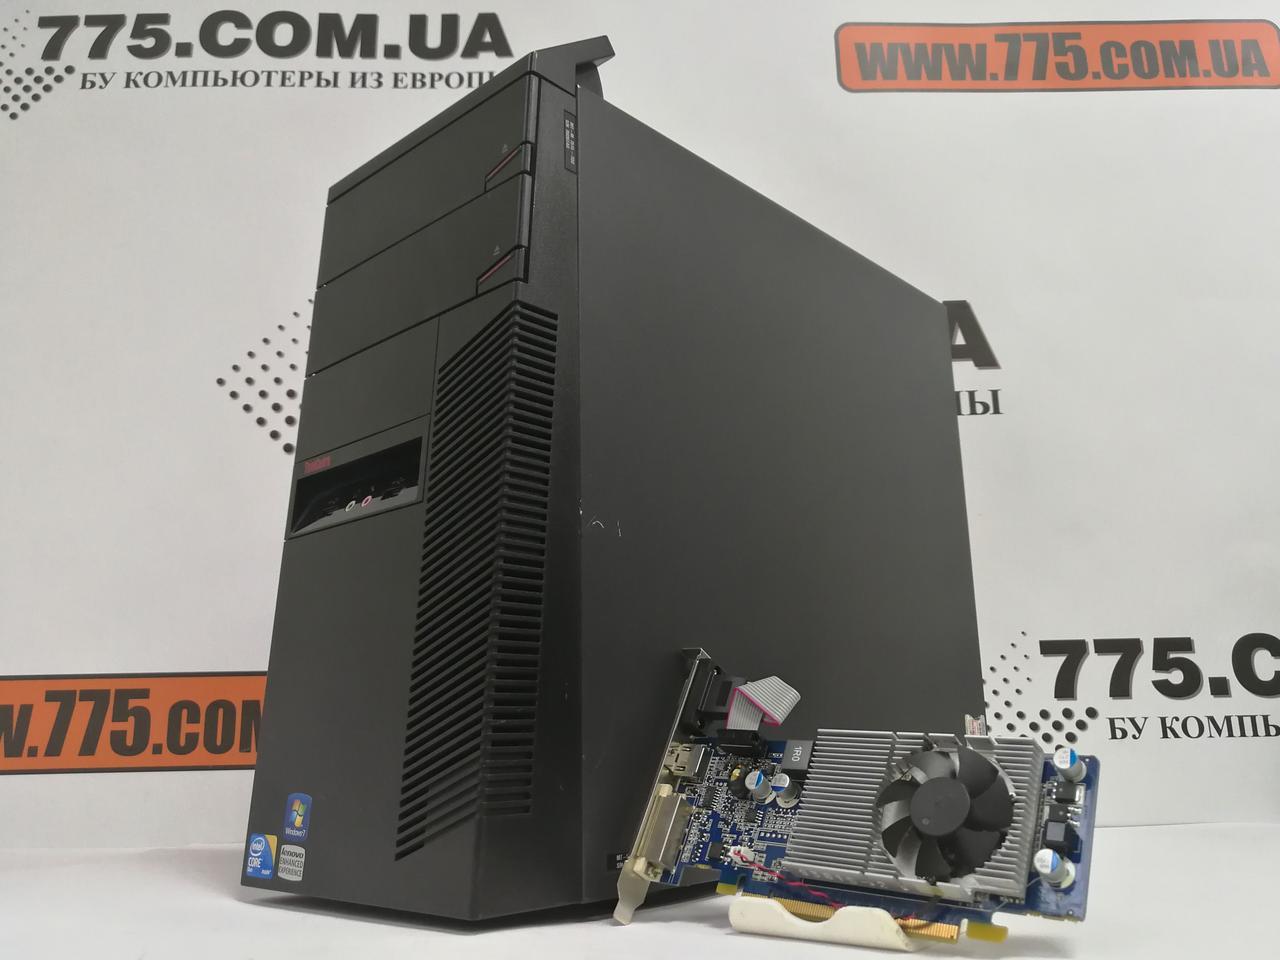 Компьютер Lenovo, Intel Core2Quad Q6600 3.0GHz, RAM 8ГБ, HDD 320ГБ, Nvidia GT210 1ГБ